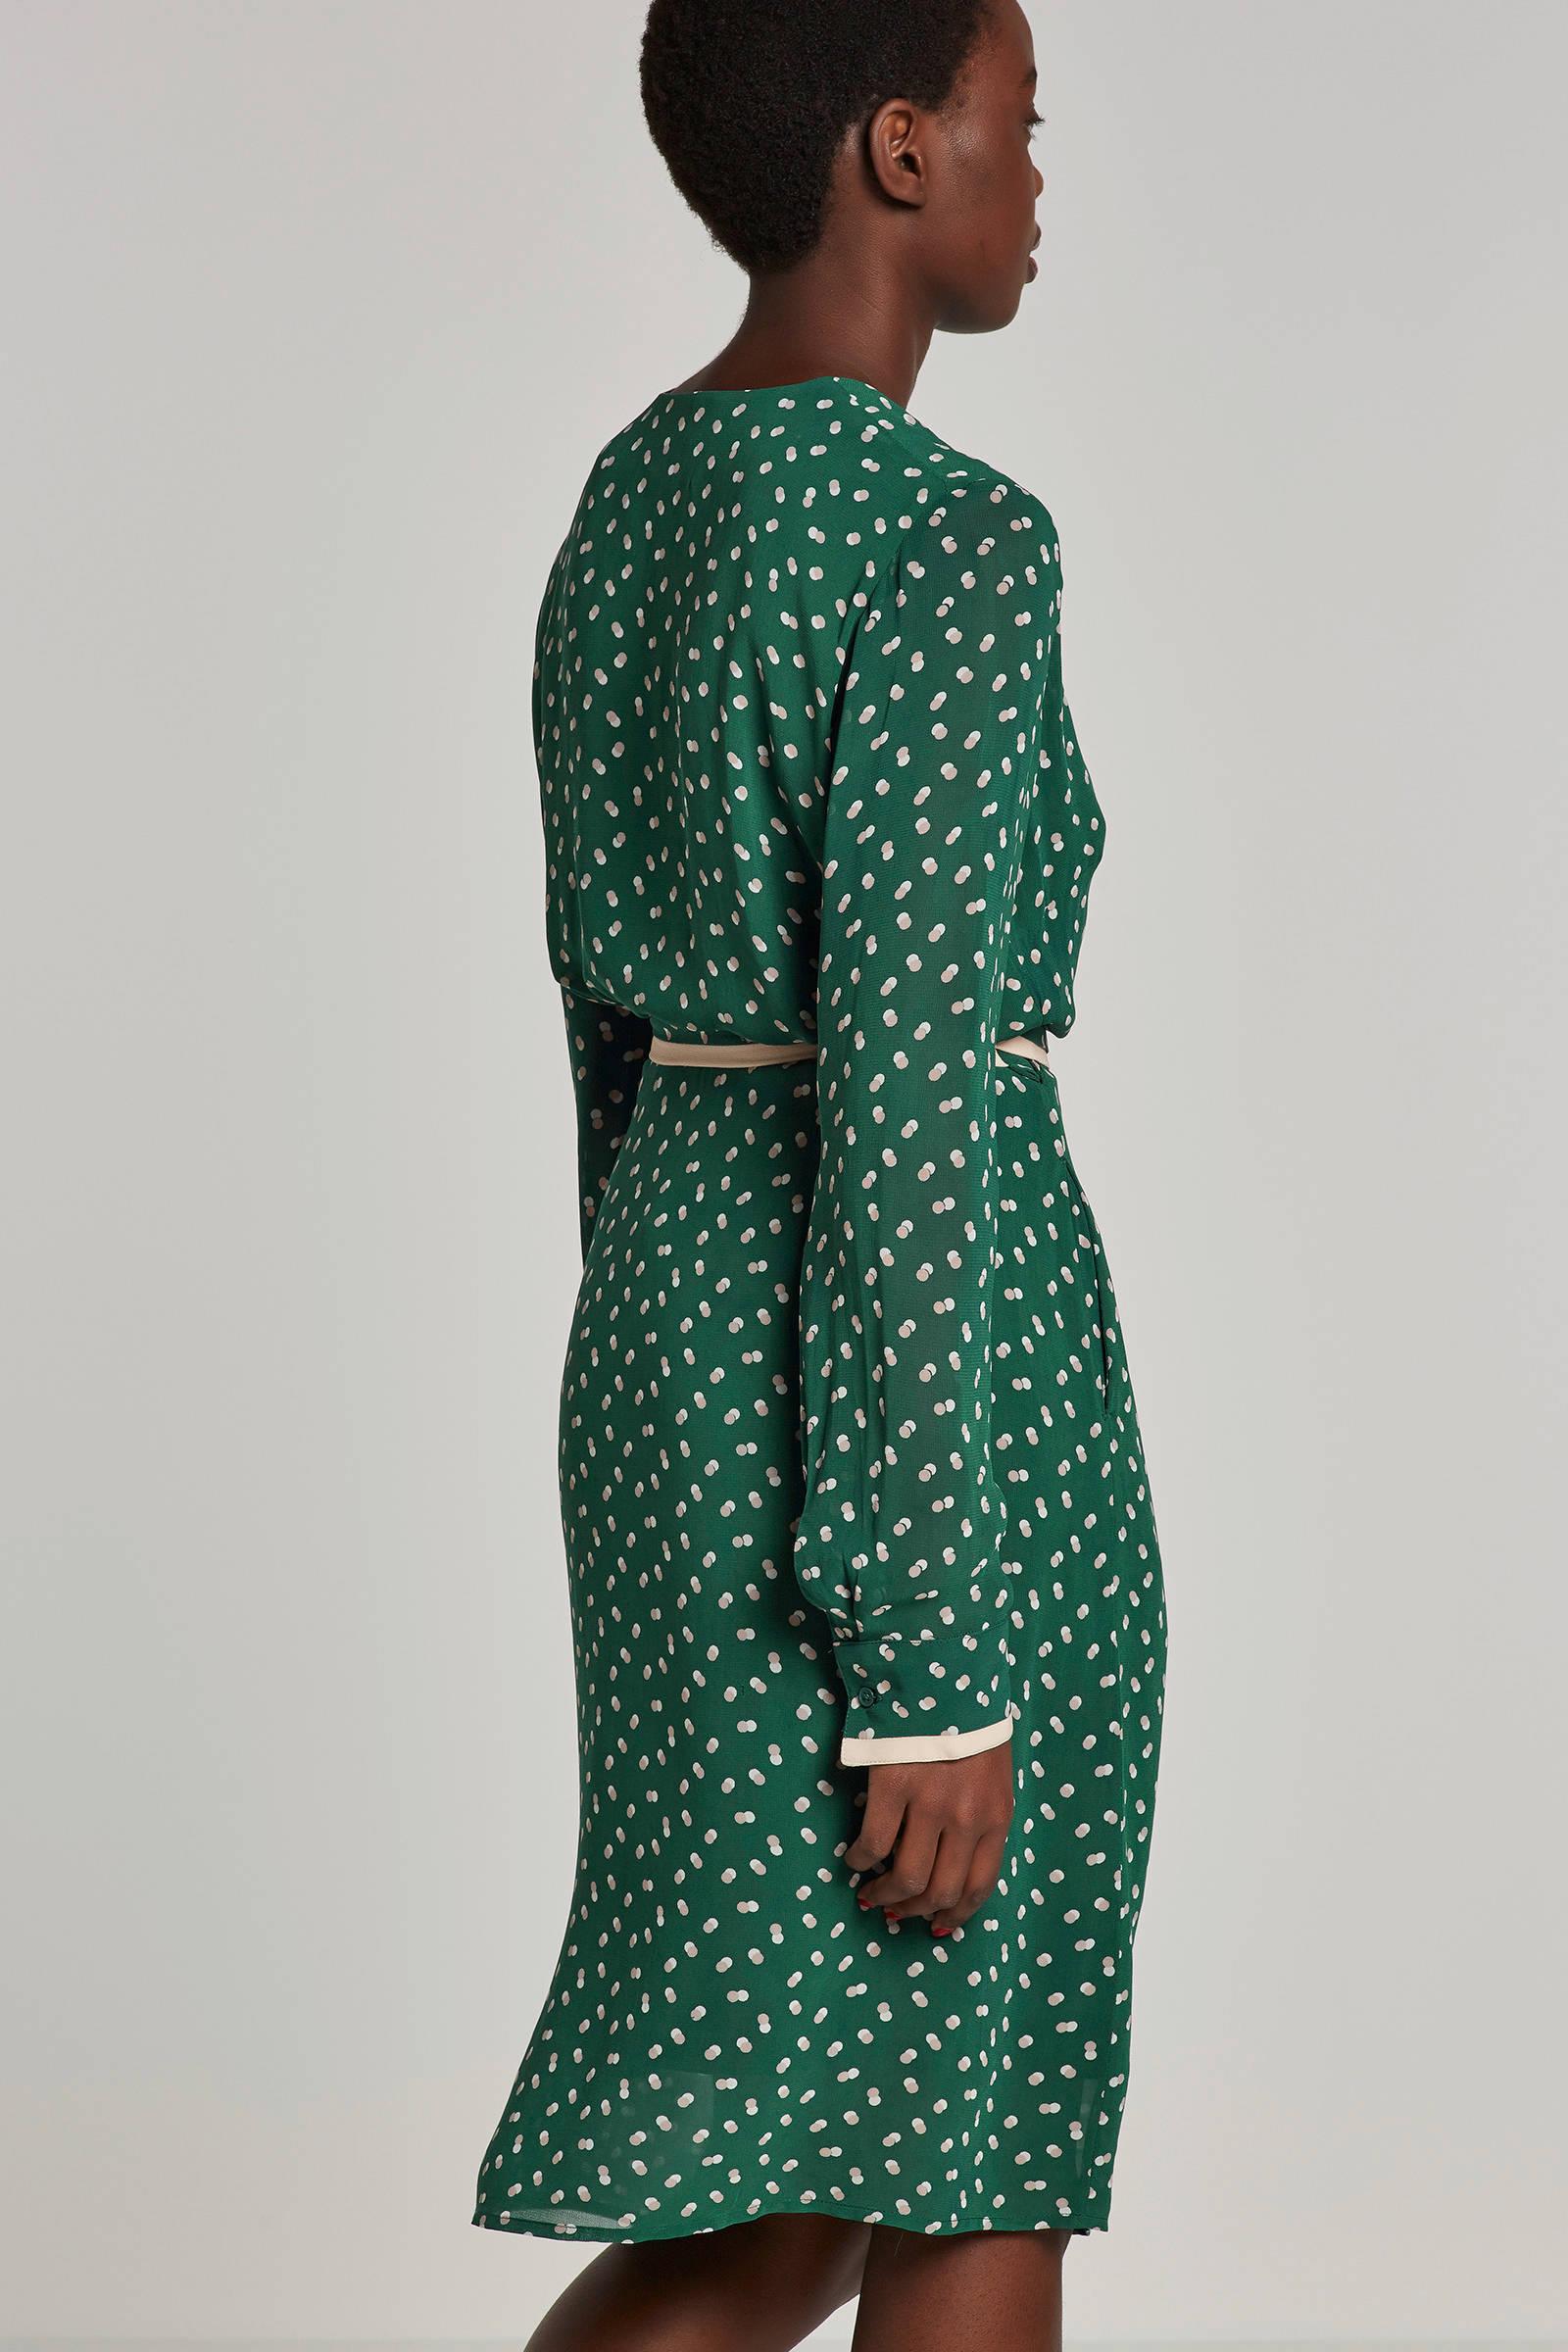 Print Met Inwear Wehkamp All Hester Over Jurk 7pqxFwqI